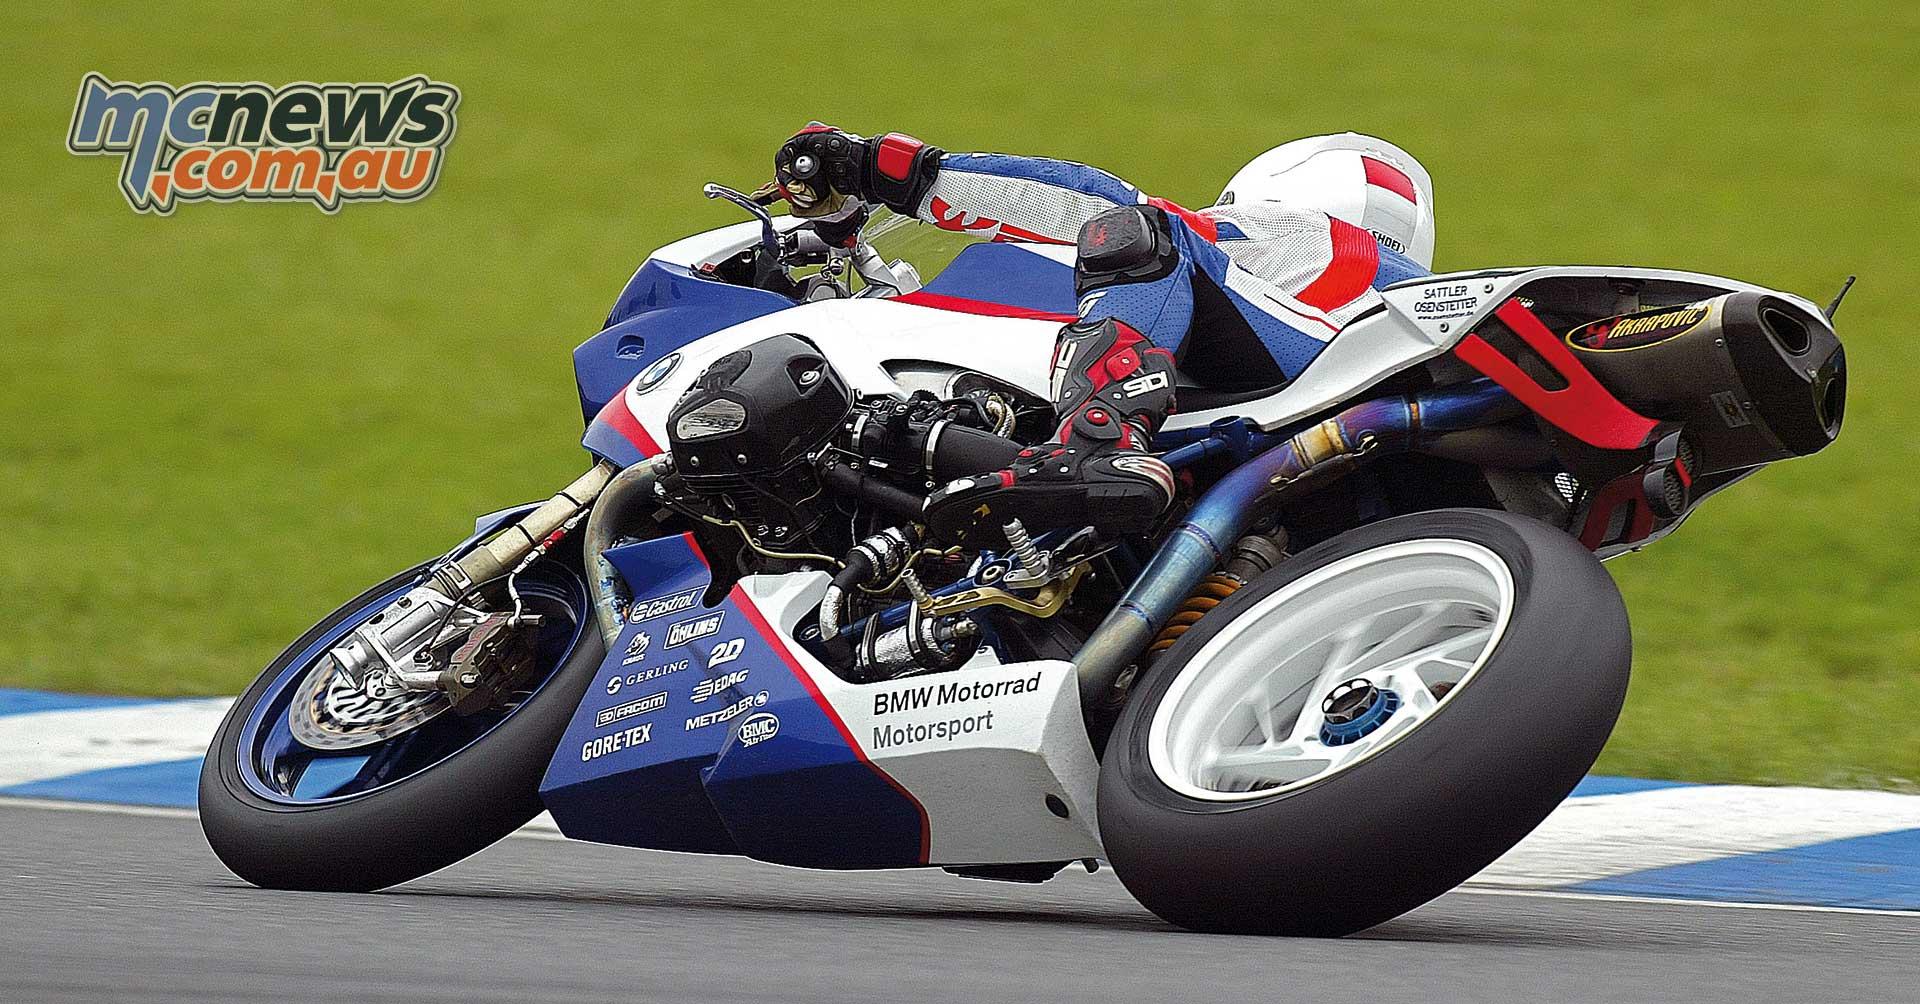 Richard Cooper racing the BMW HP2 Sport